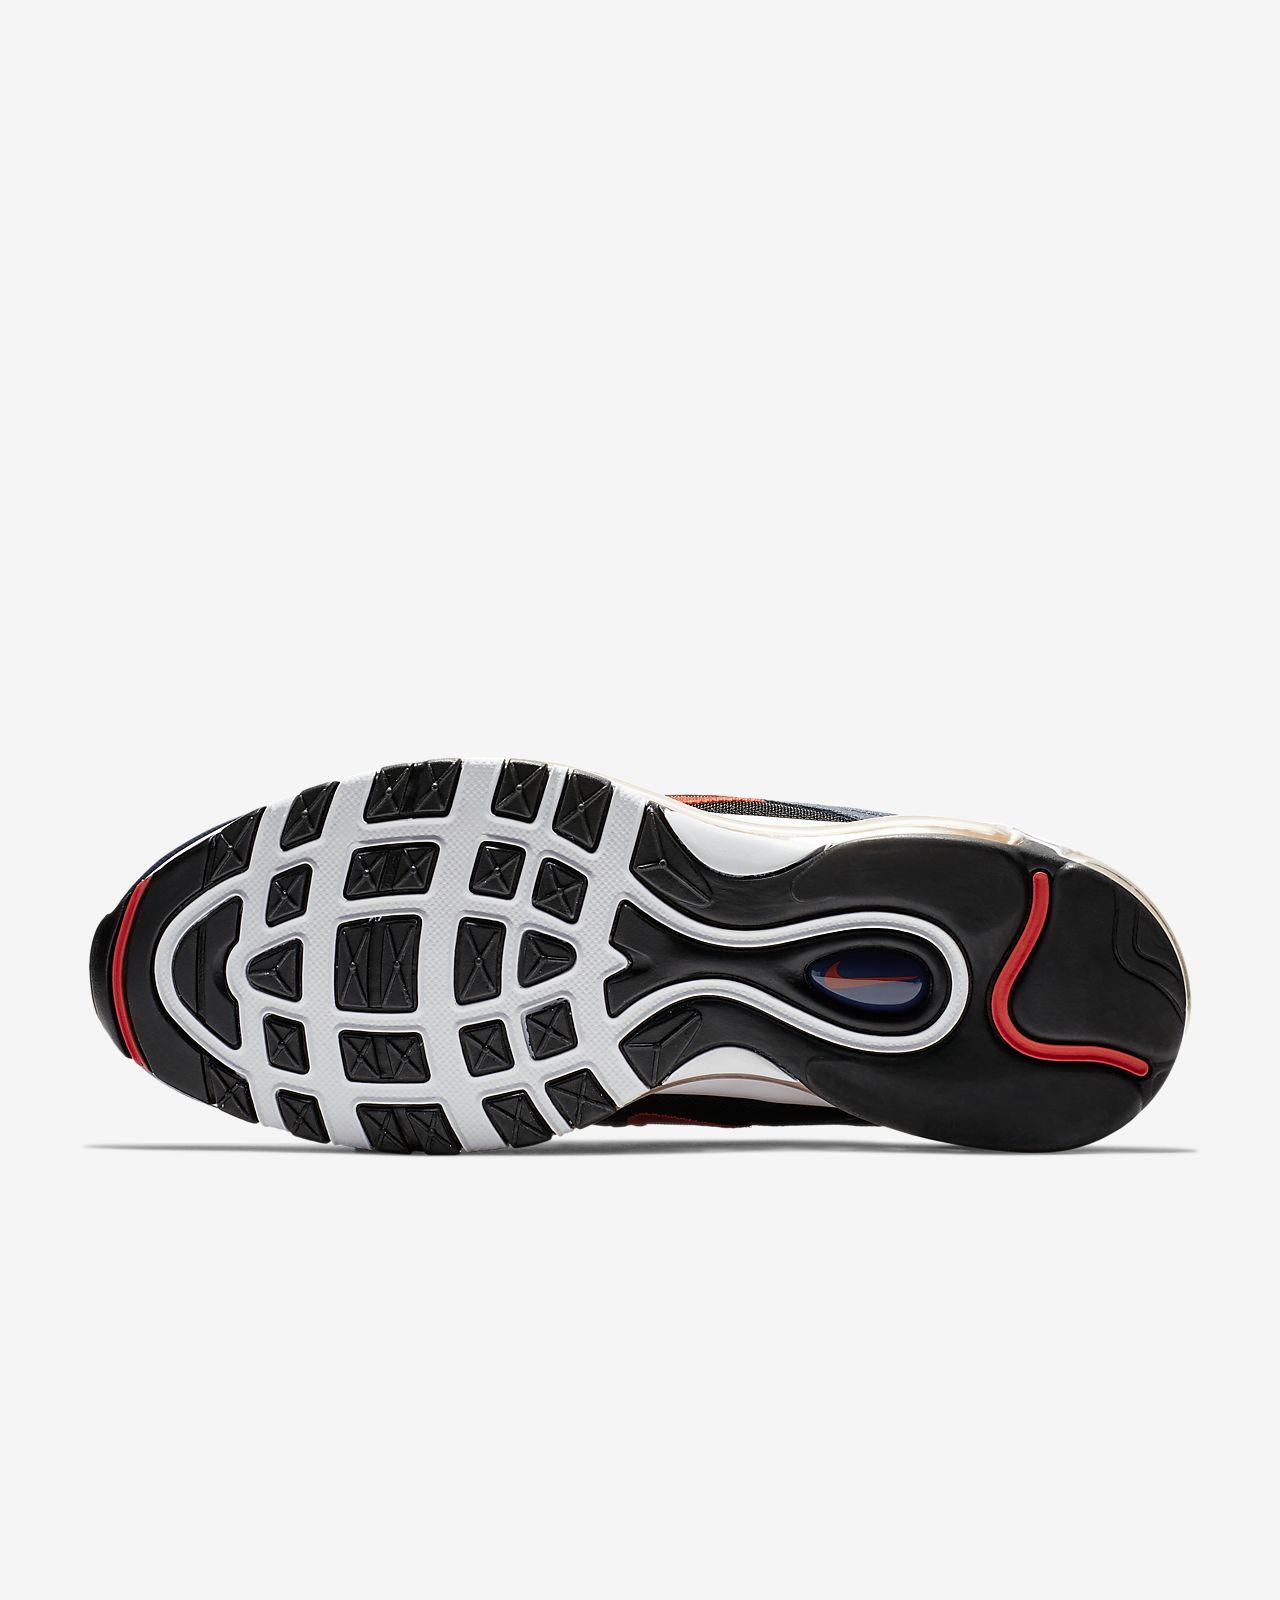 0c457c21 Мужские кроссовки Nike Air Max 97. Nike.com RU